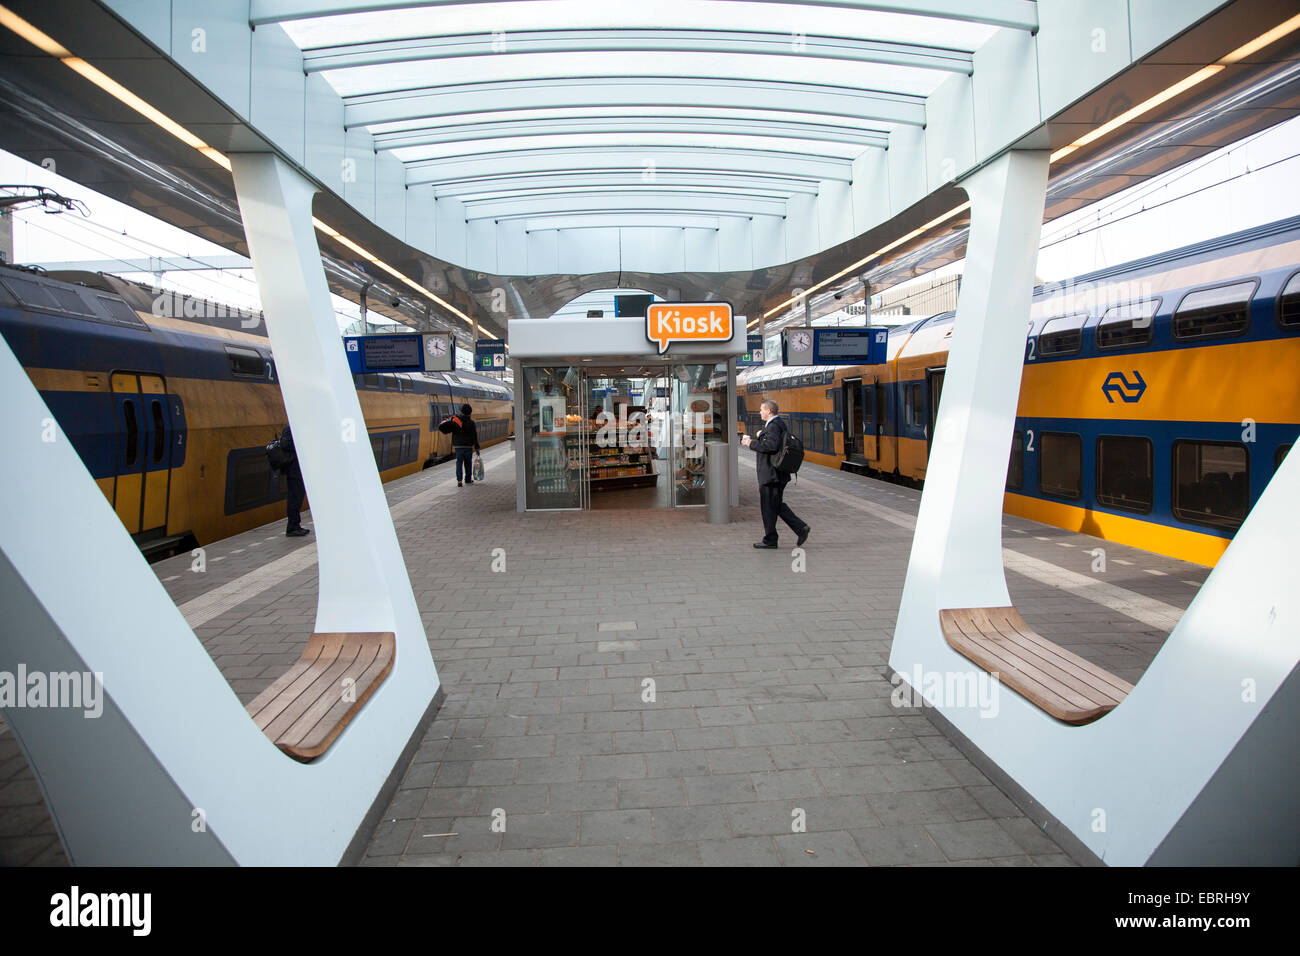 Intercity Train In Netherlands Stock Photos & Intercity Train In